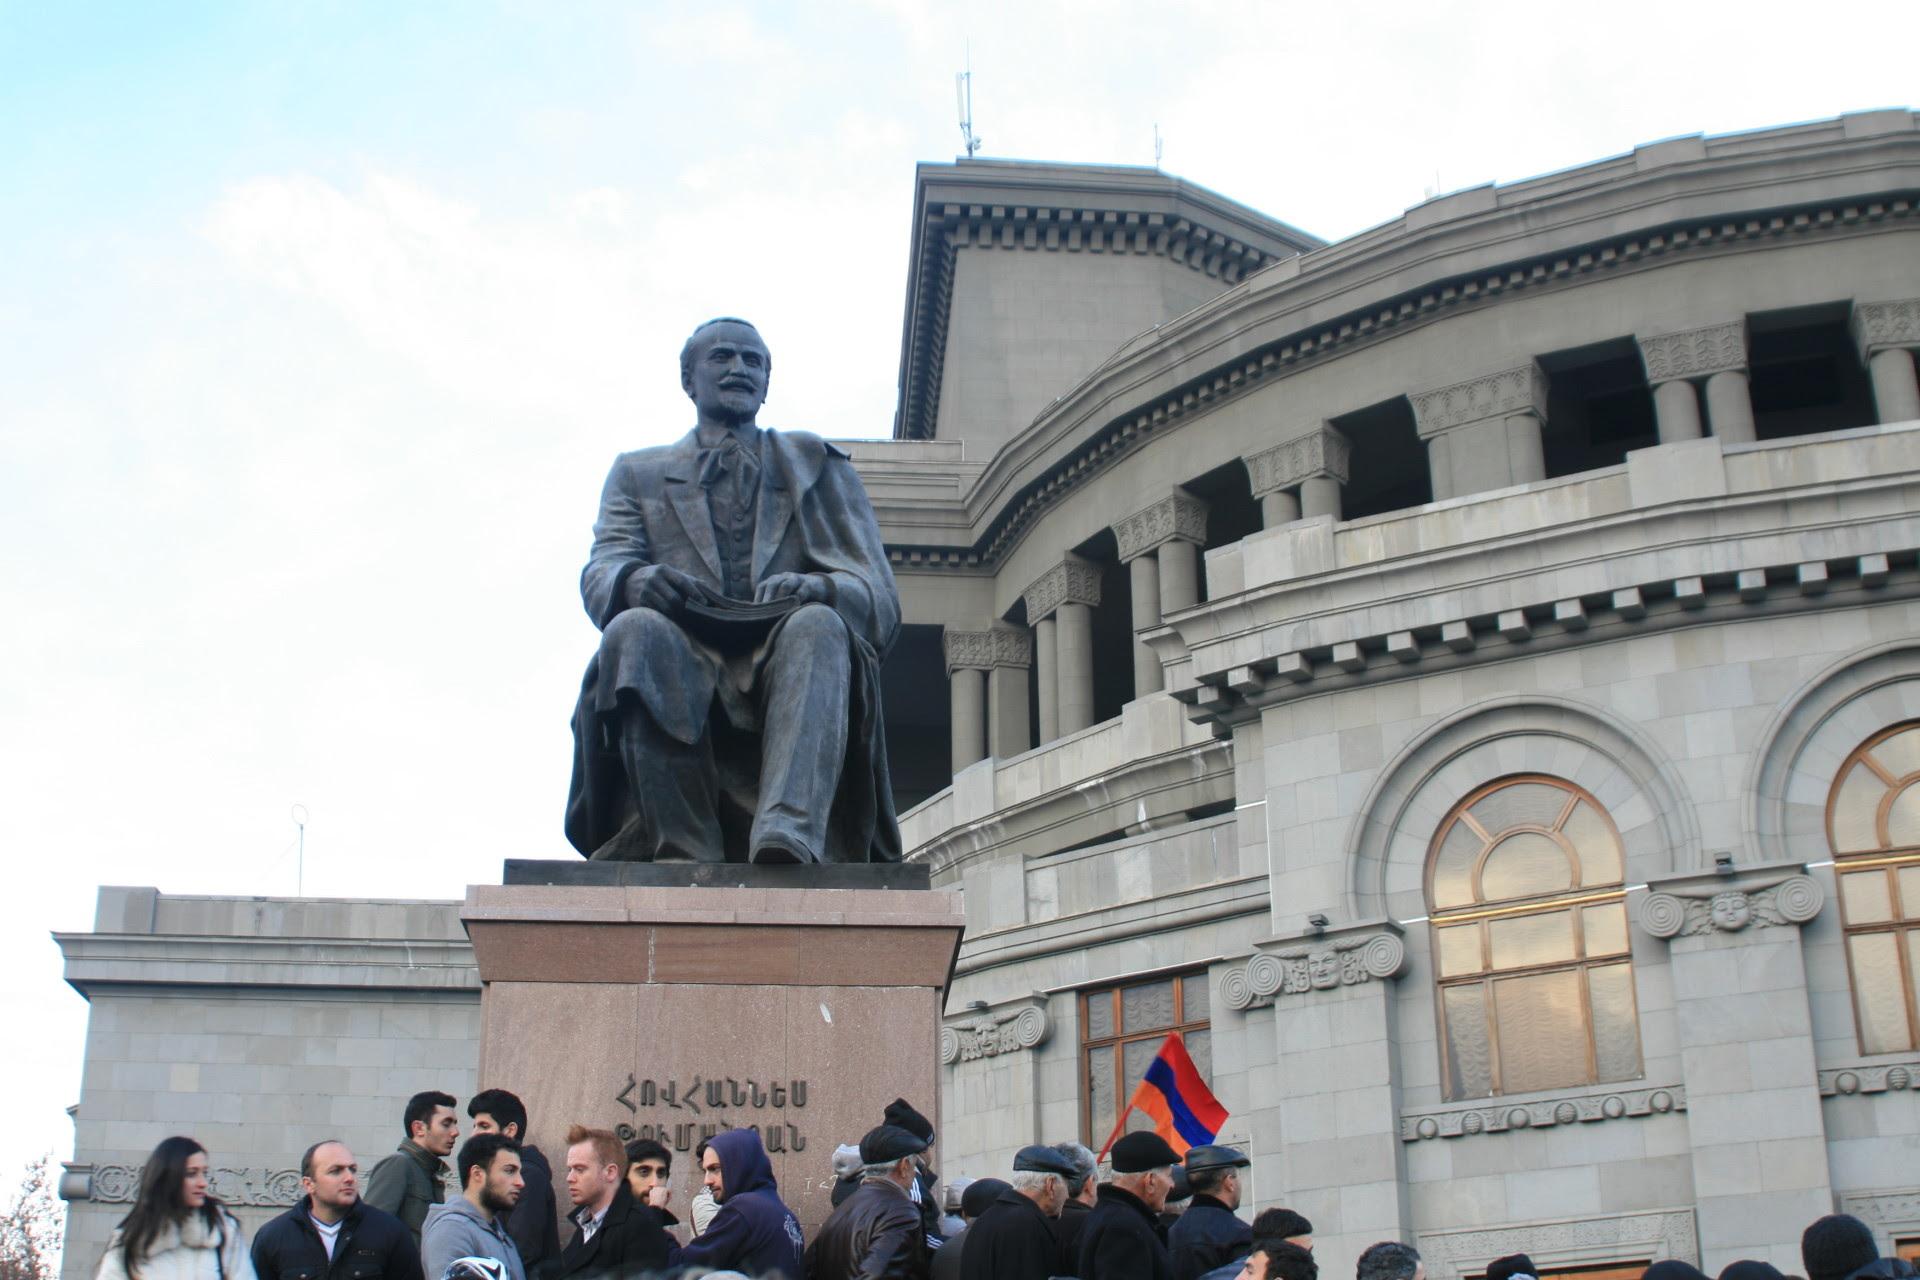 http://www.armenianweekly.com/wp-content/uploads/2013/02/IMG_8450.jpg